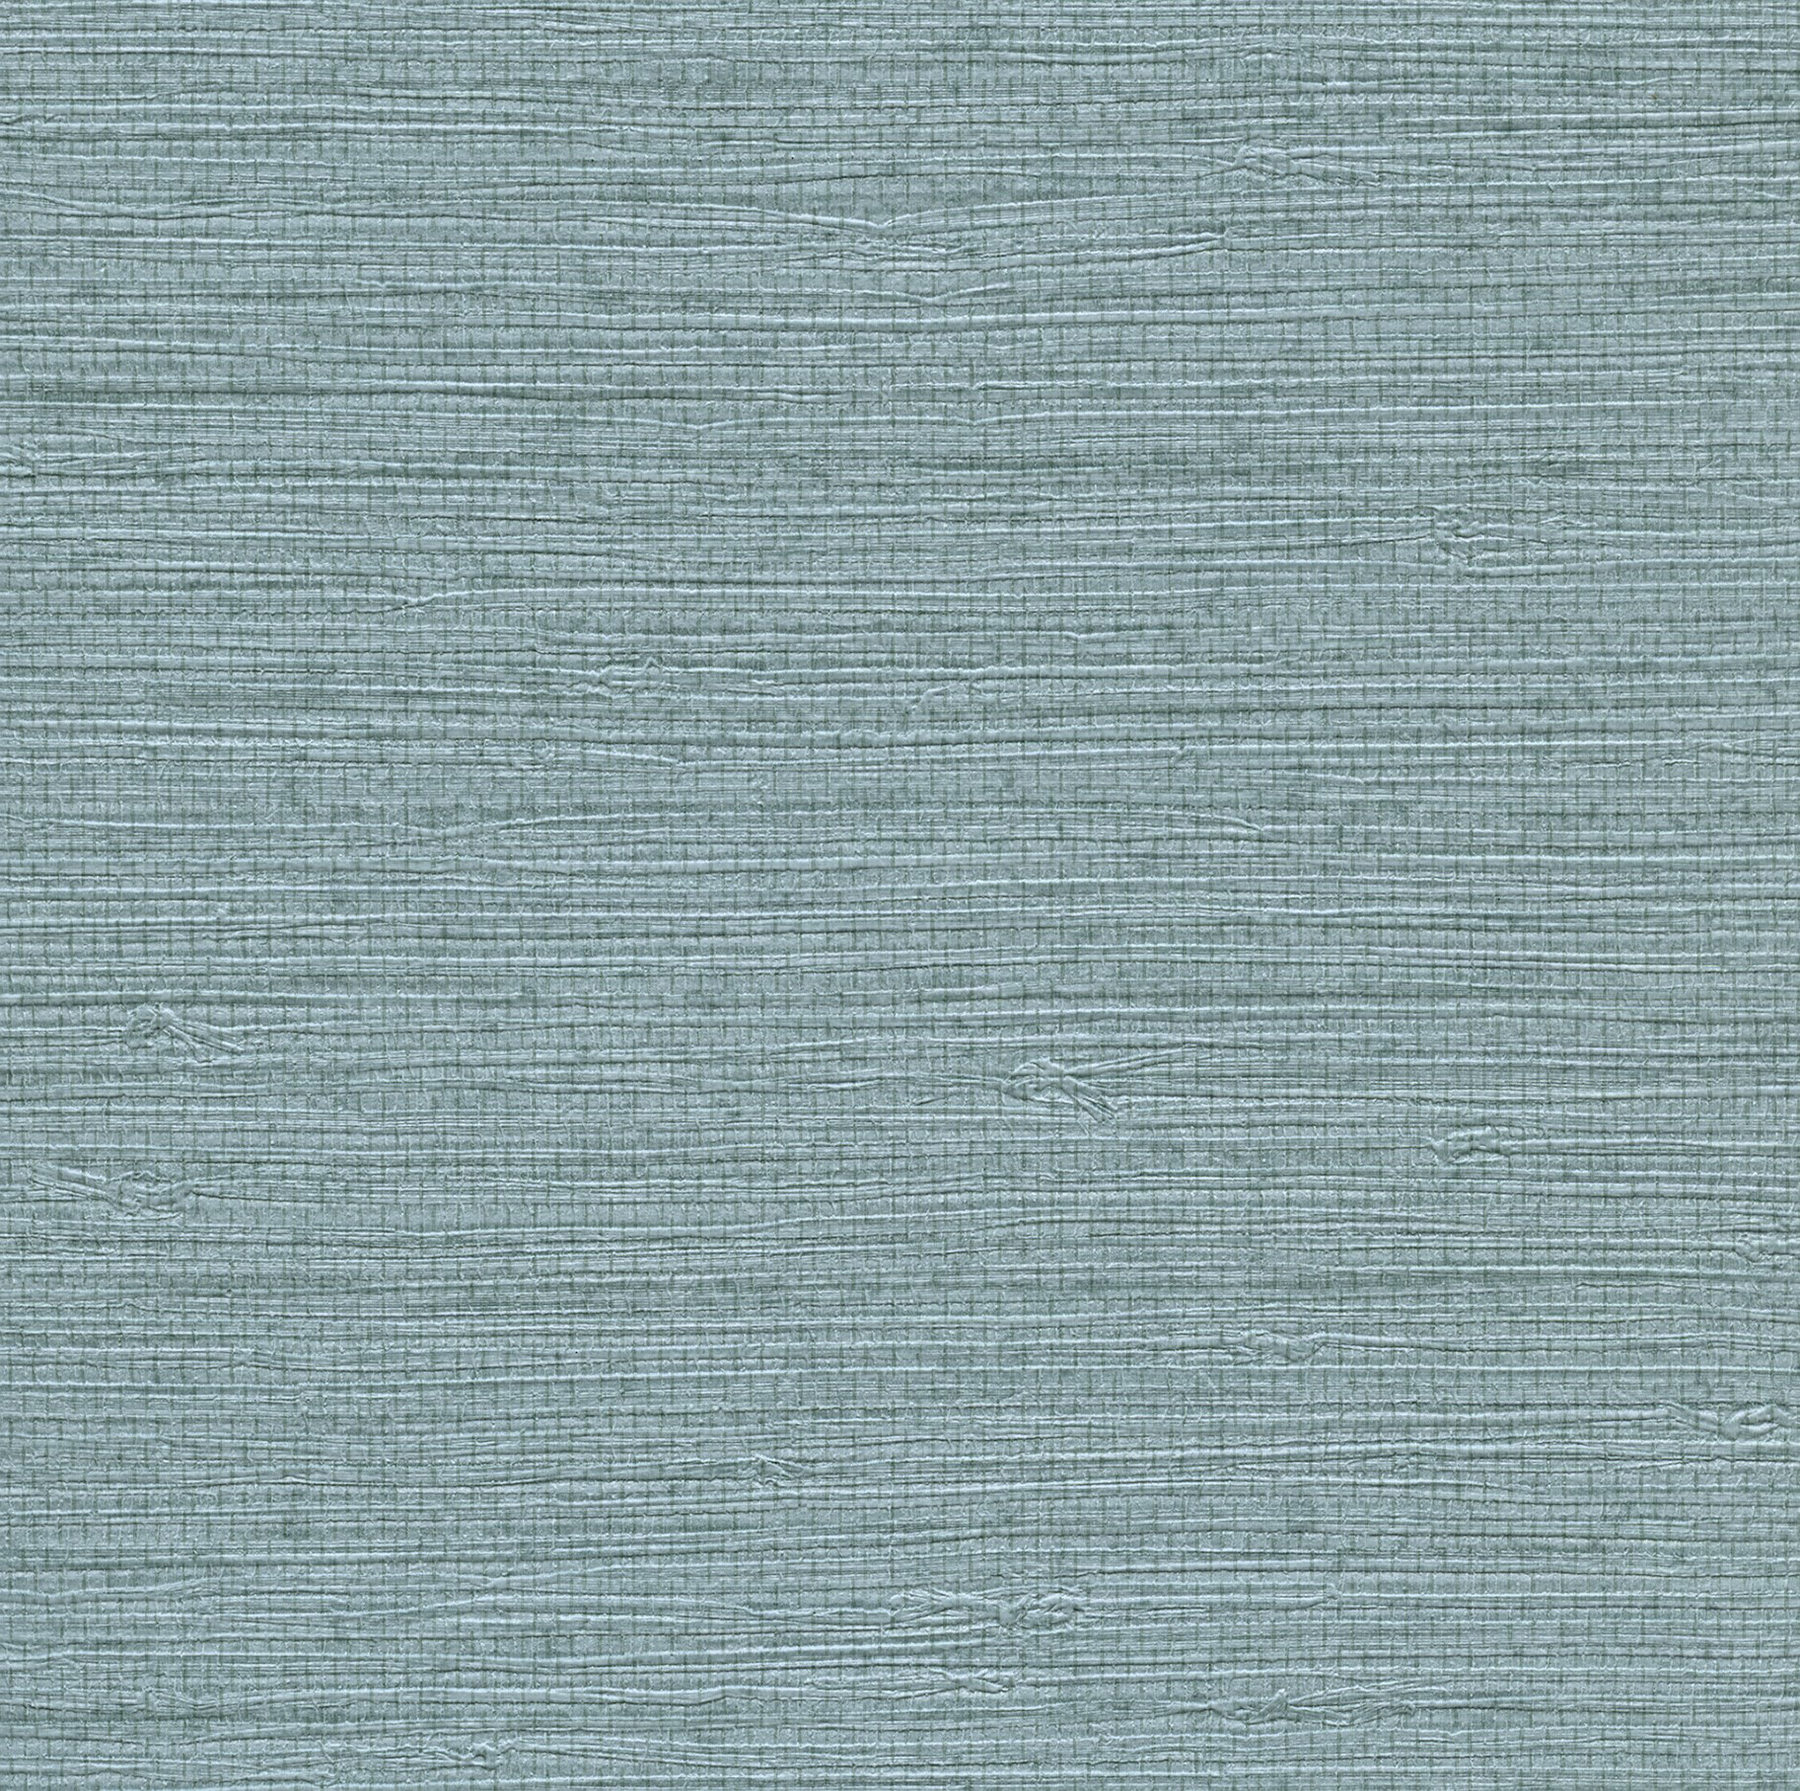 Picture of Bali Blue Seagrass Wallpaper